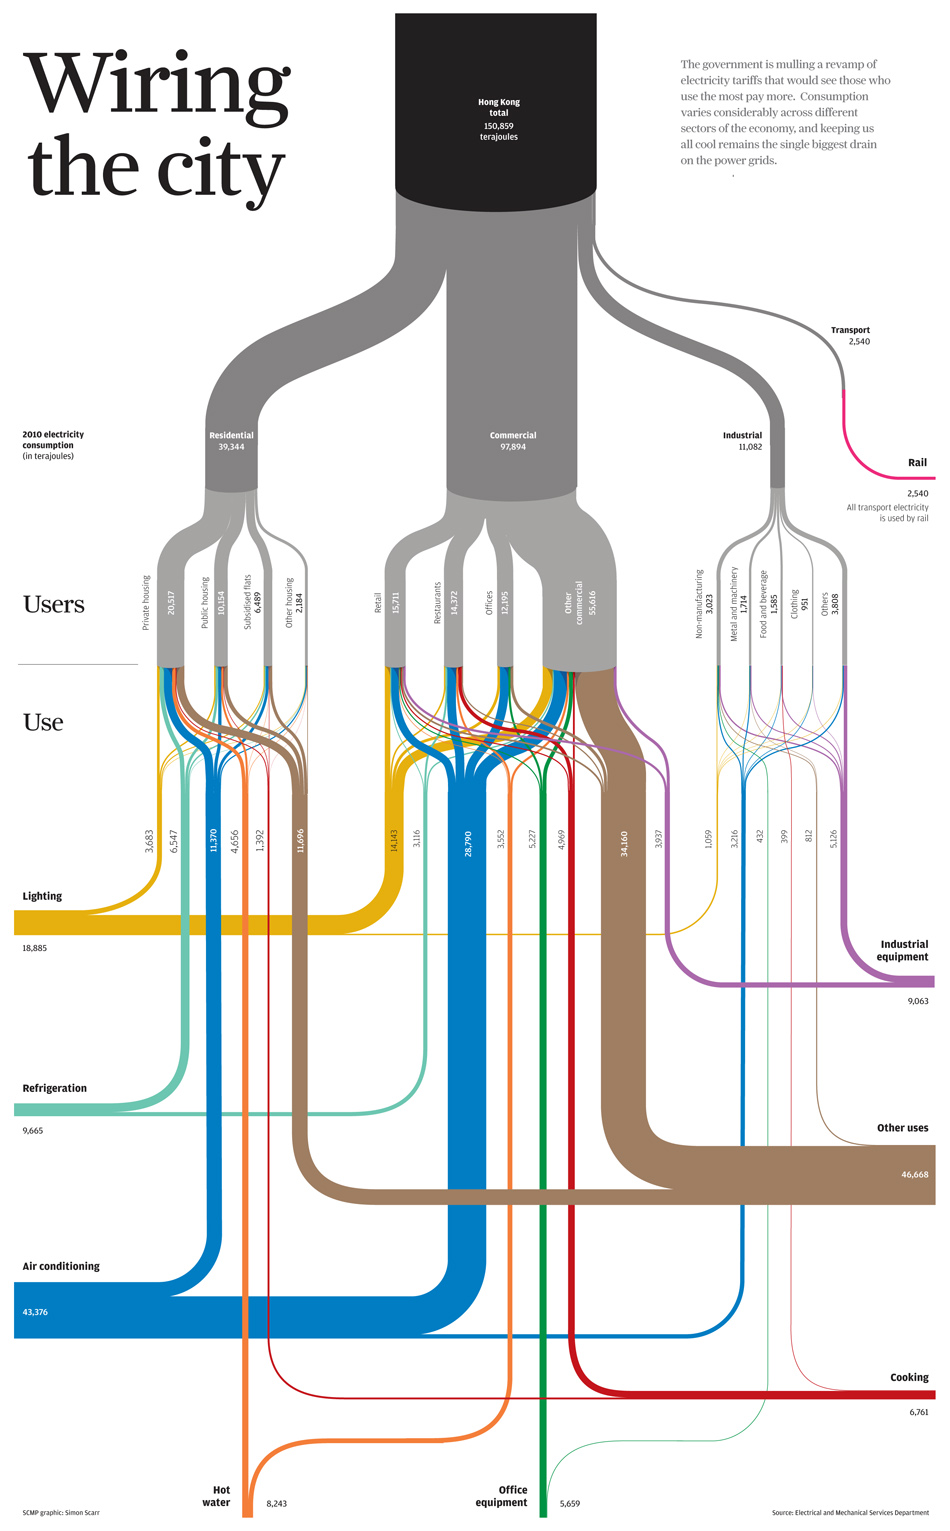 wiring_the_city sopa 2013 award wiring the city sankey diagrams  at n-0.co